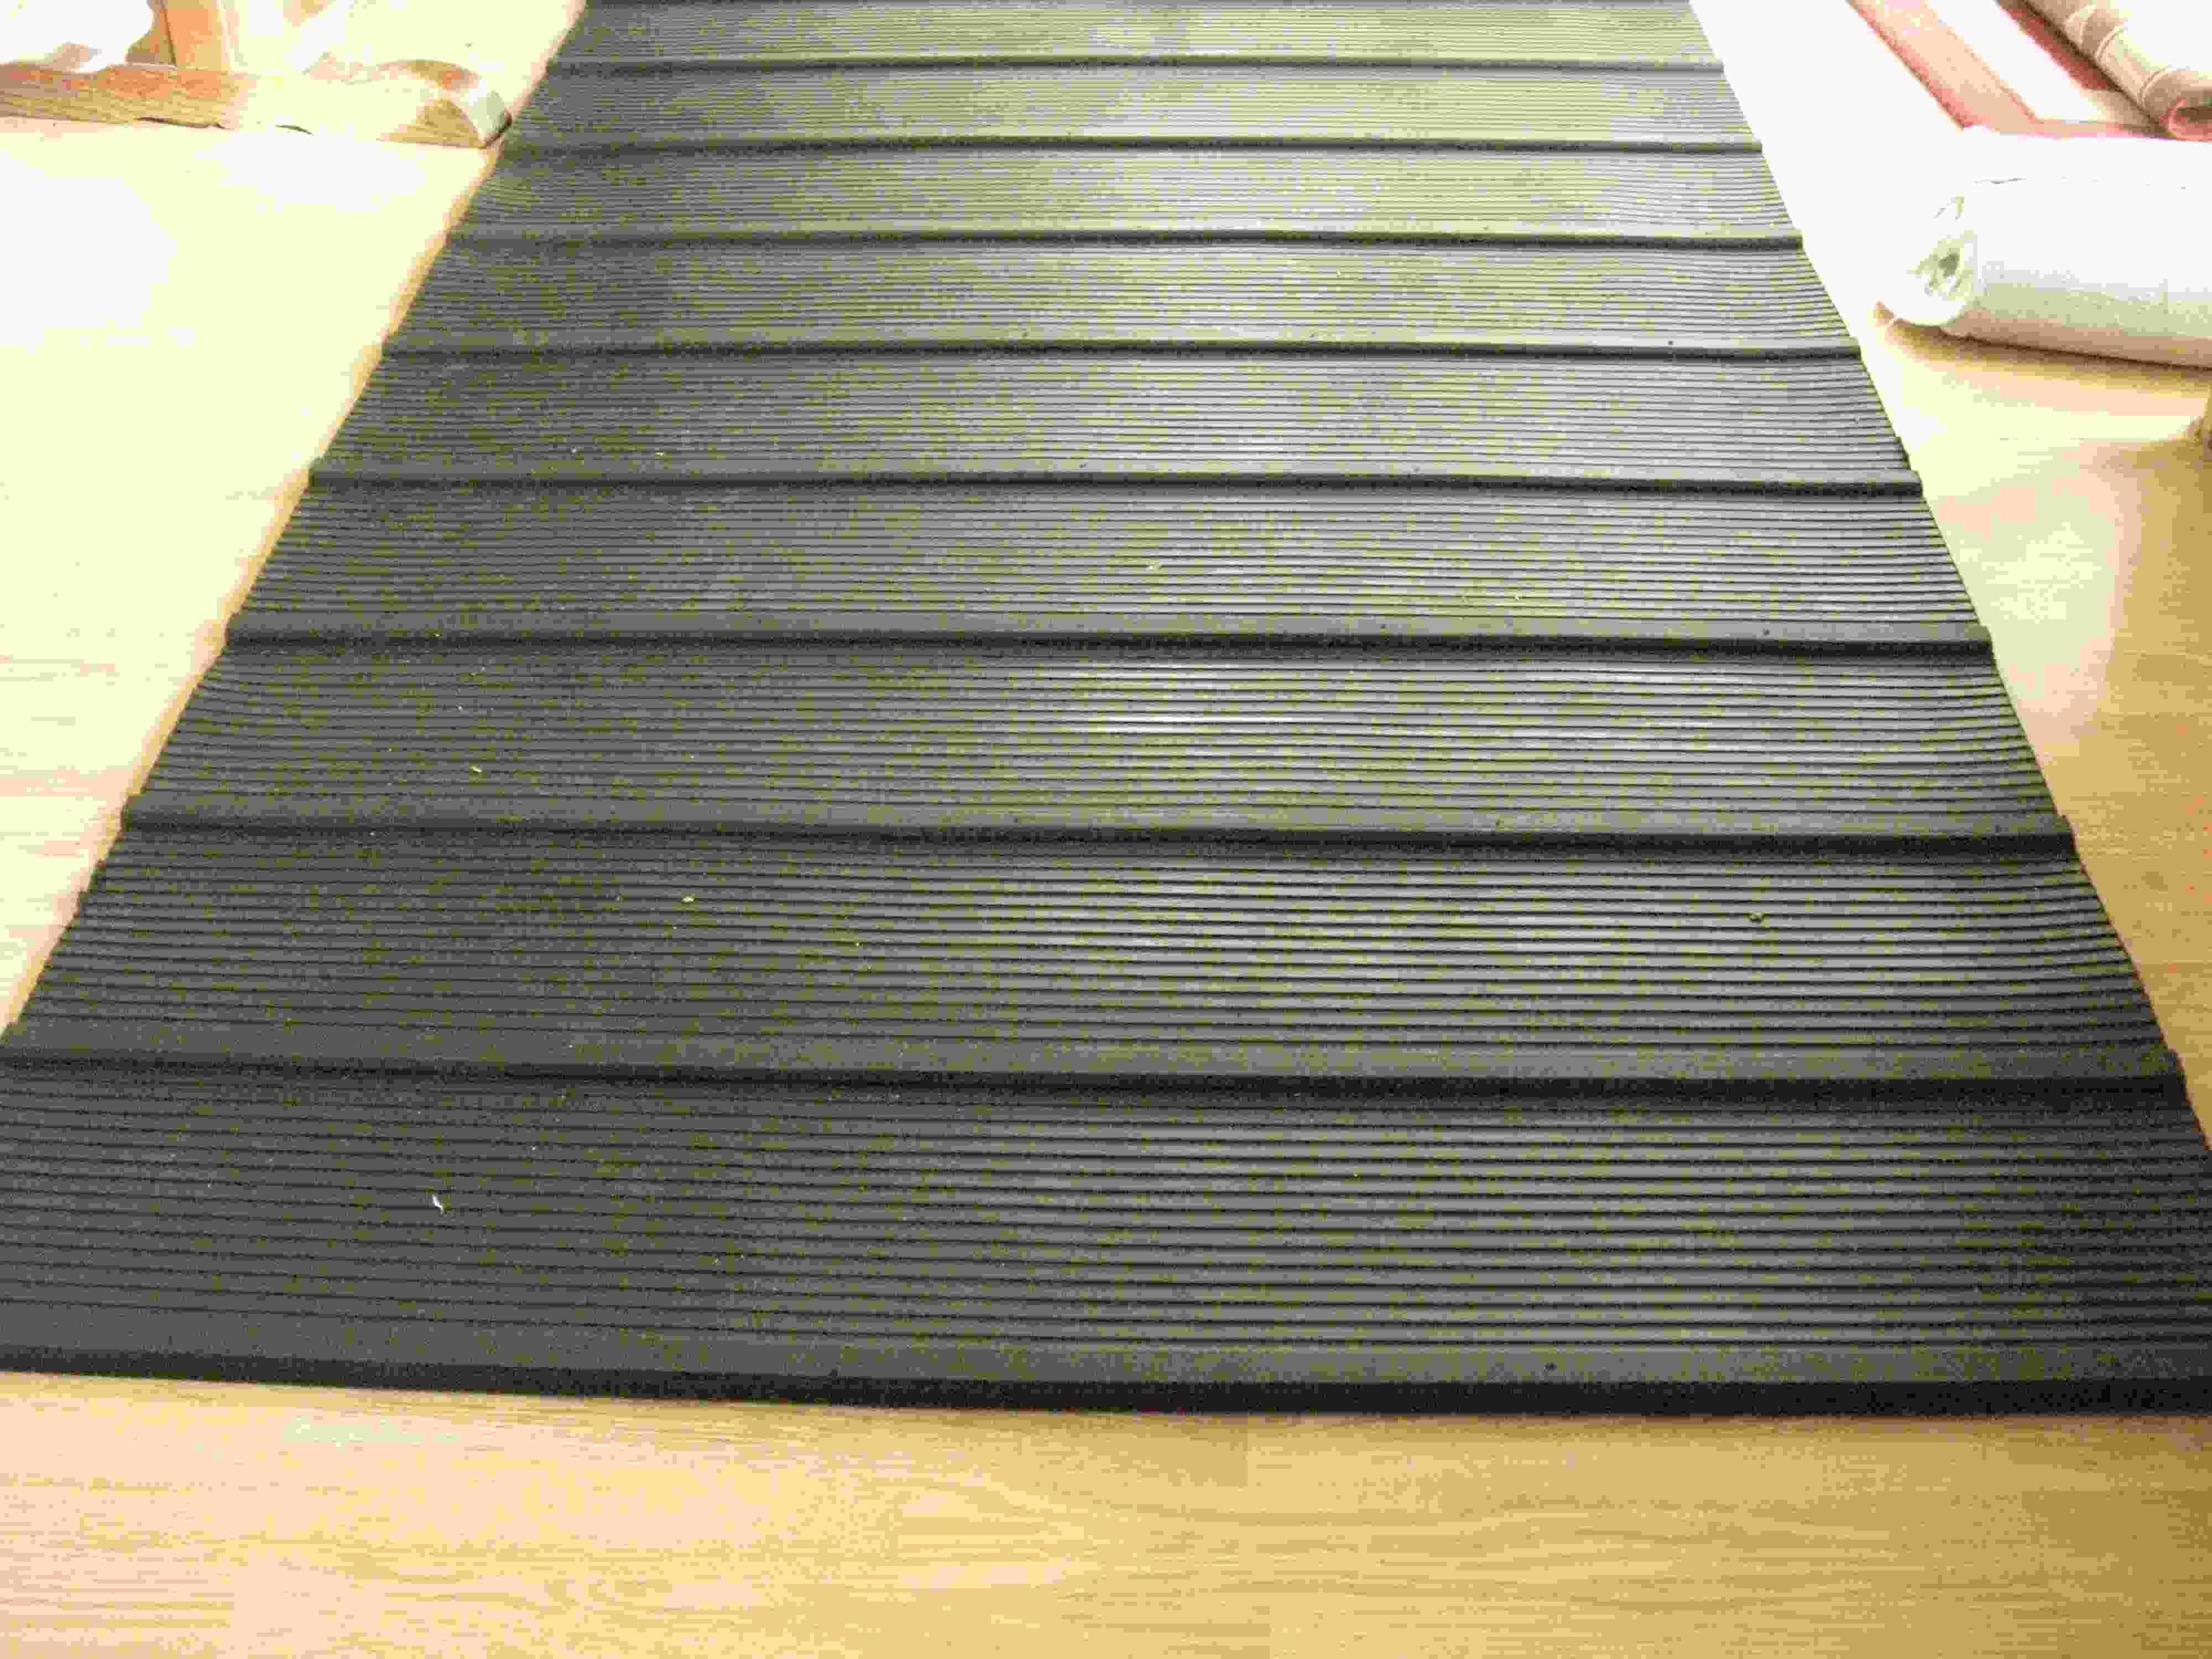 Horse Trailer Flooring : Horse trailer floor mats gurus